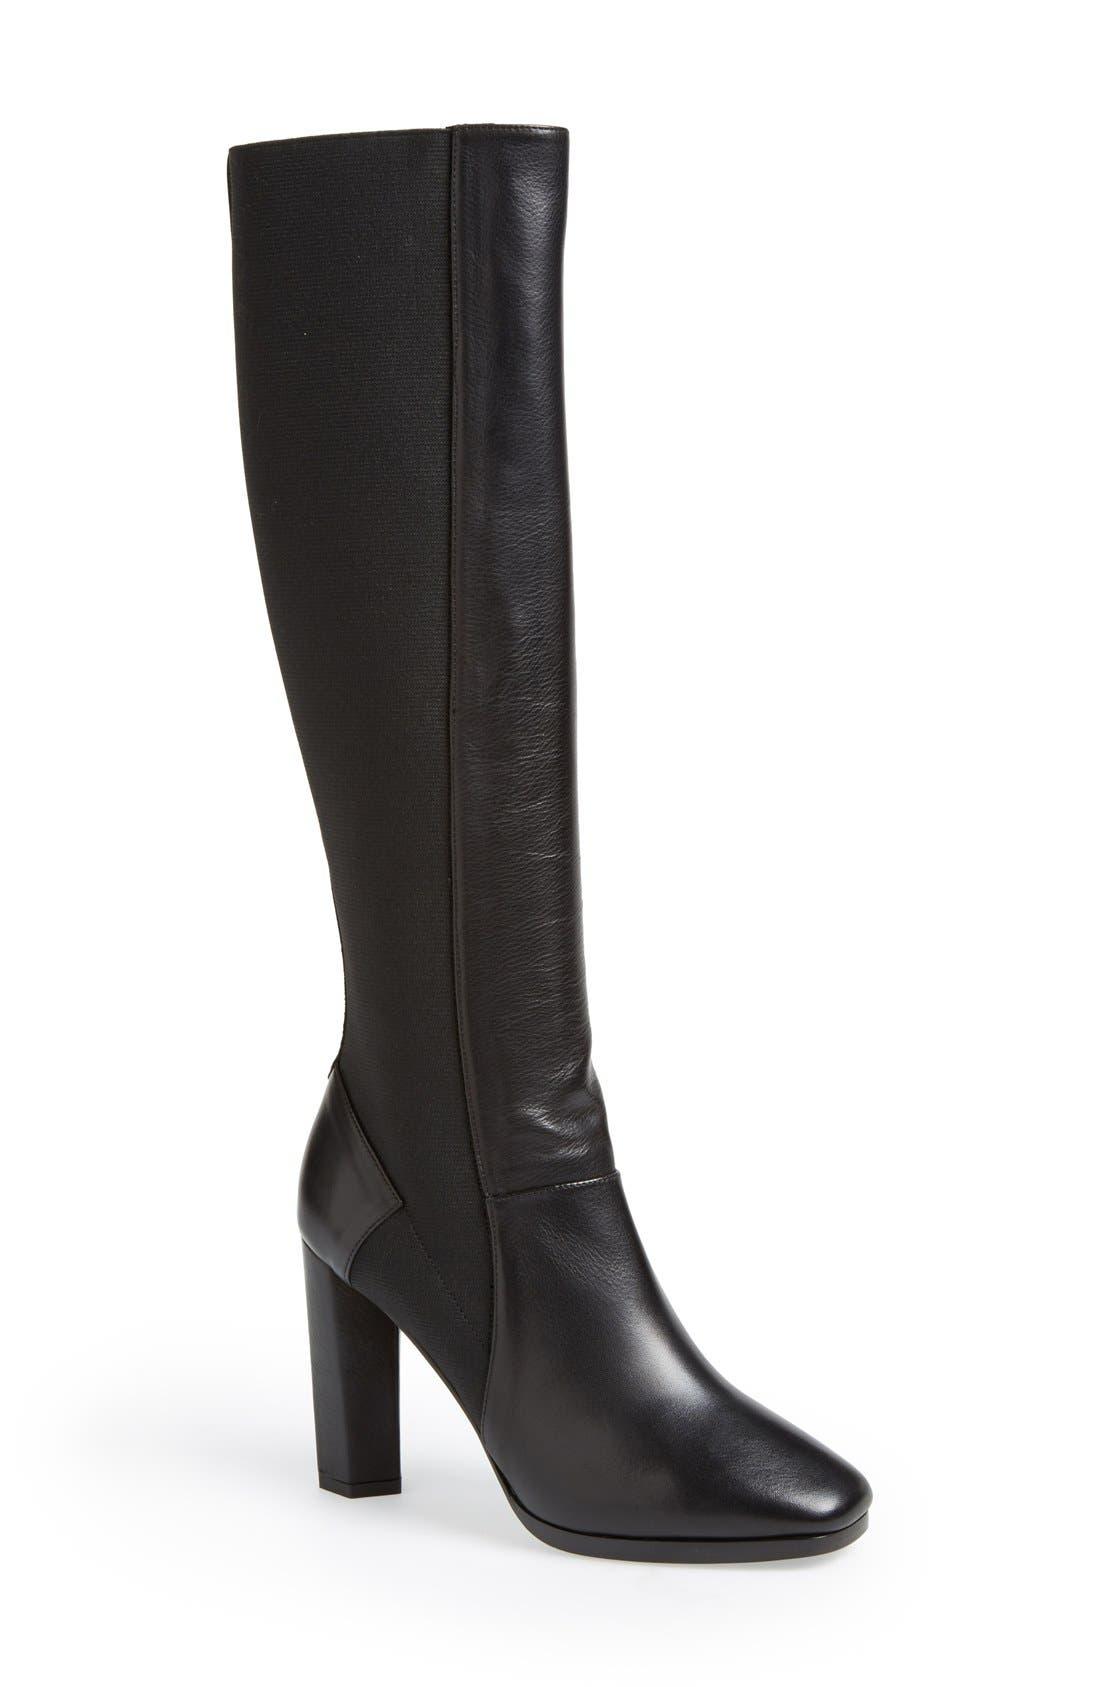 Alternate Image 1 Selected - Diane von Furstenberg 'Pella' Tall Boot (Women)